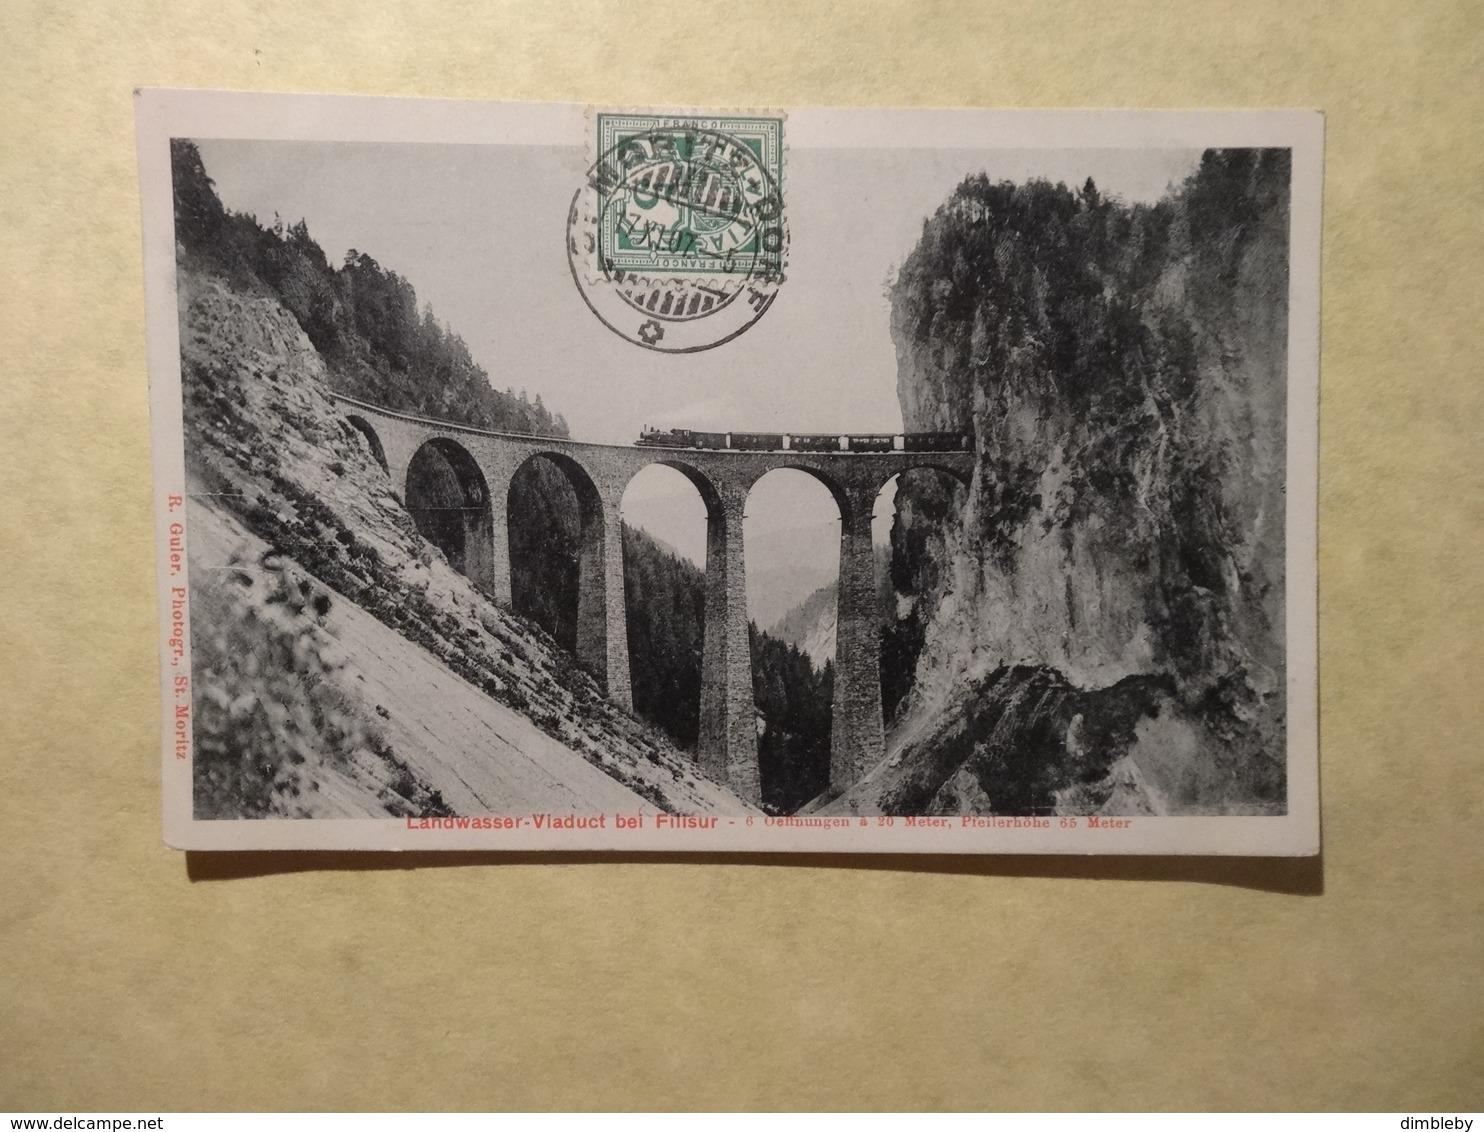 Albulabahn - Landwasser-Viadukt Bei Filisur (5004) - GR Grisons